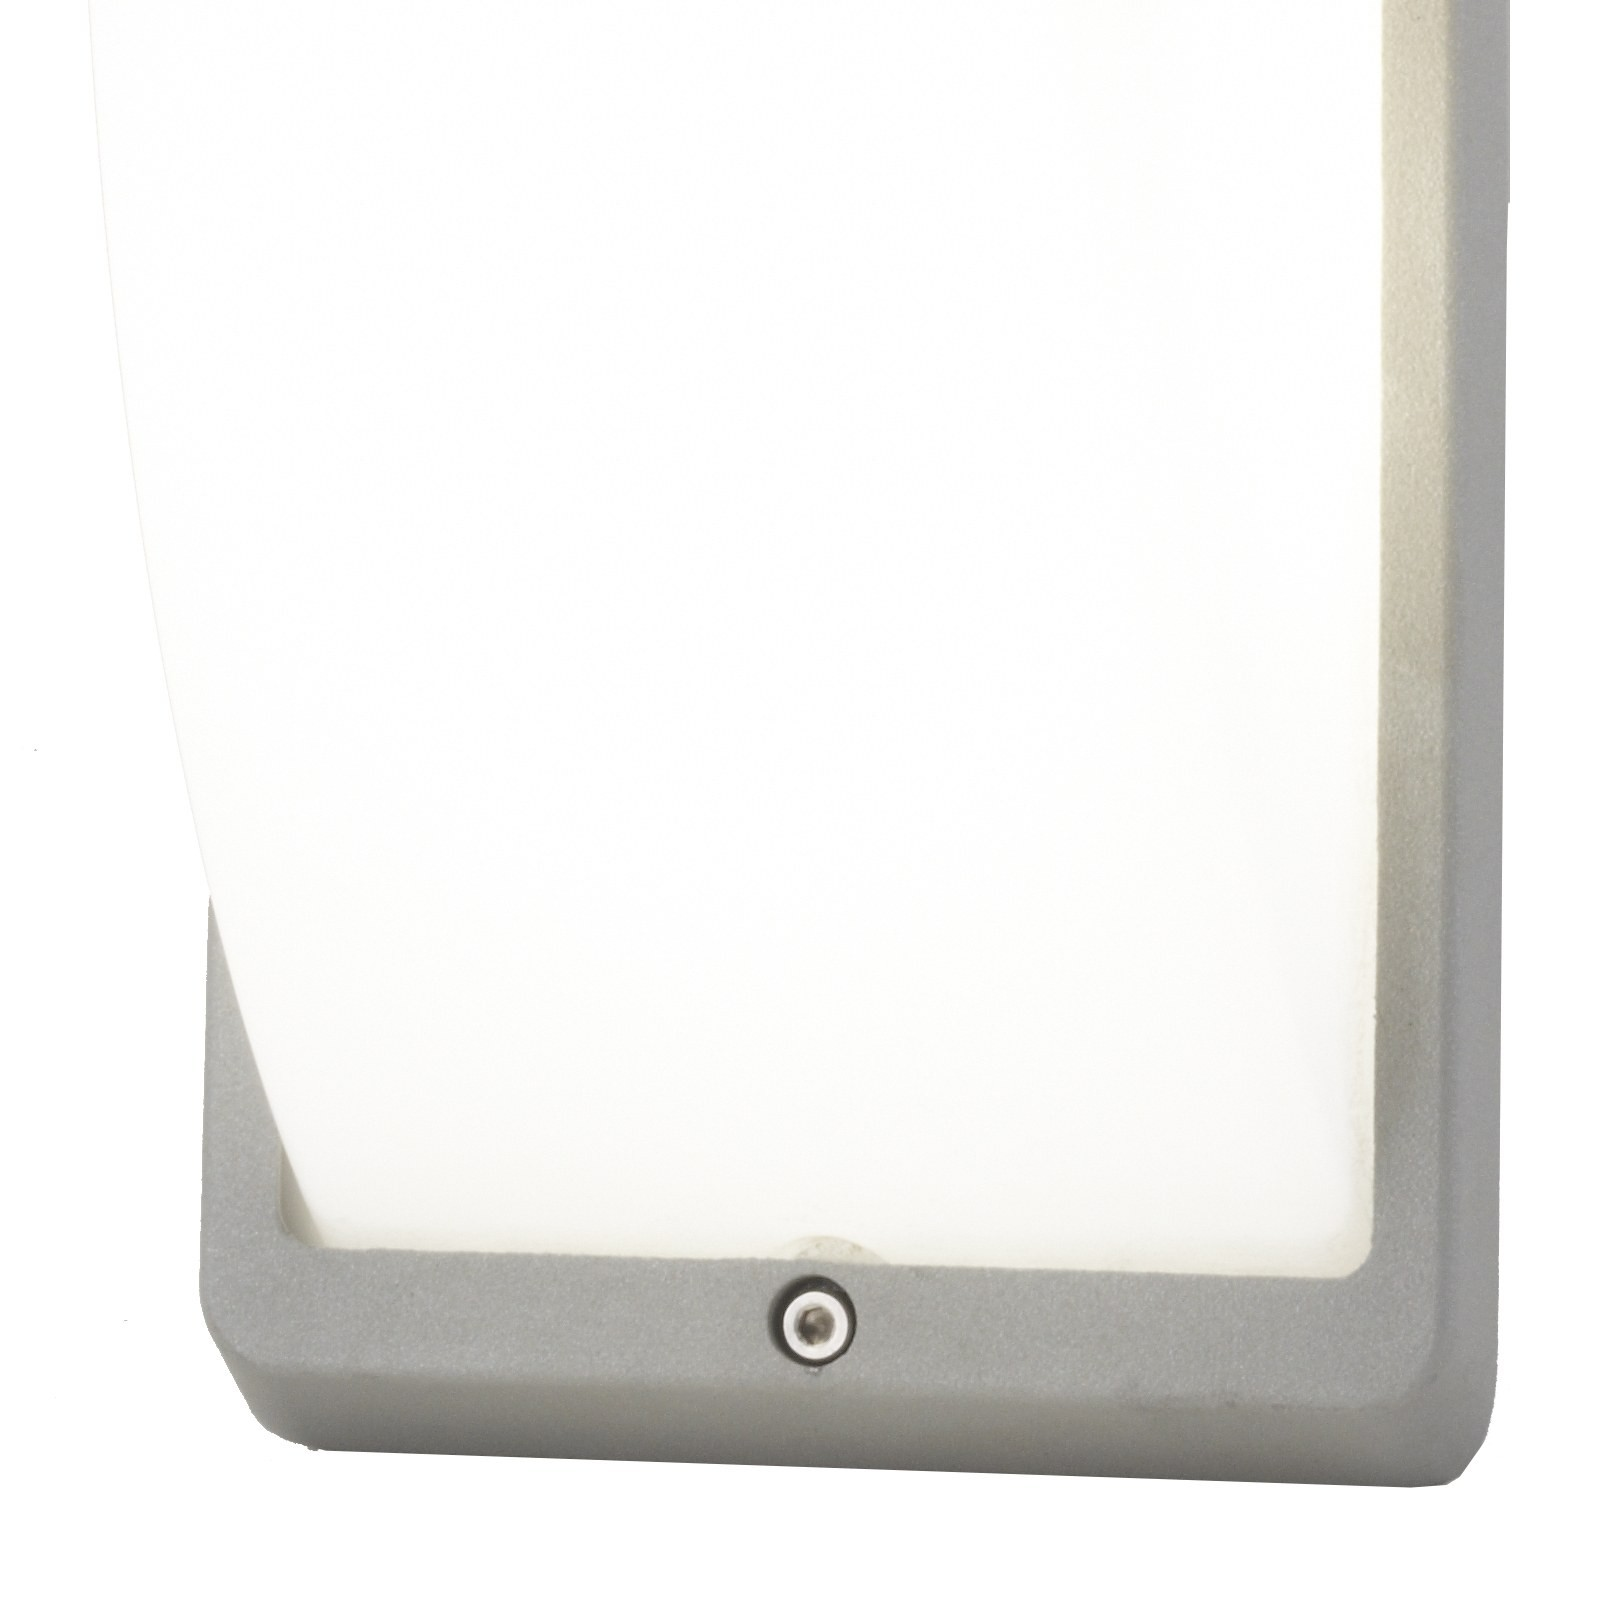 Plafoniera applique lampada led design a parete light in - Lampada led design ...